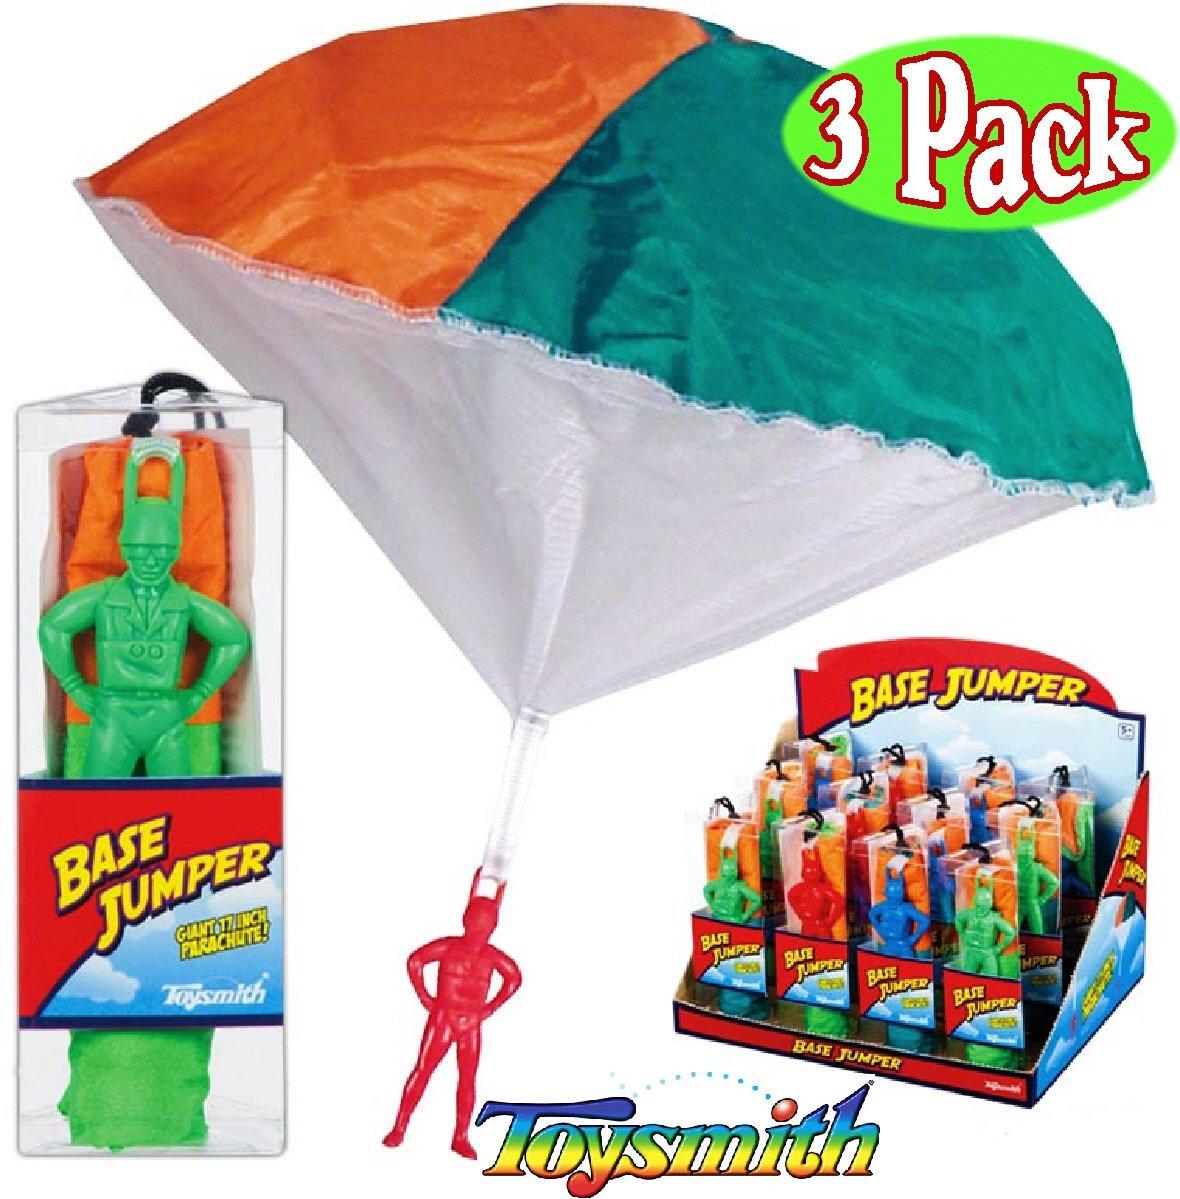 Toysmith Base Jumpers Parachute Men Red, Blue & Green Gift Set Bundle - 3 Pack